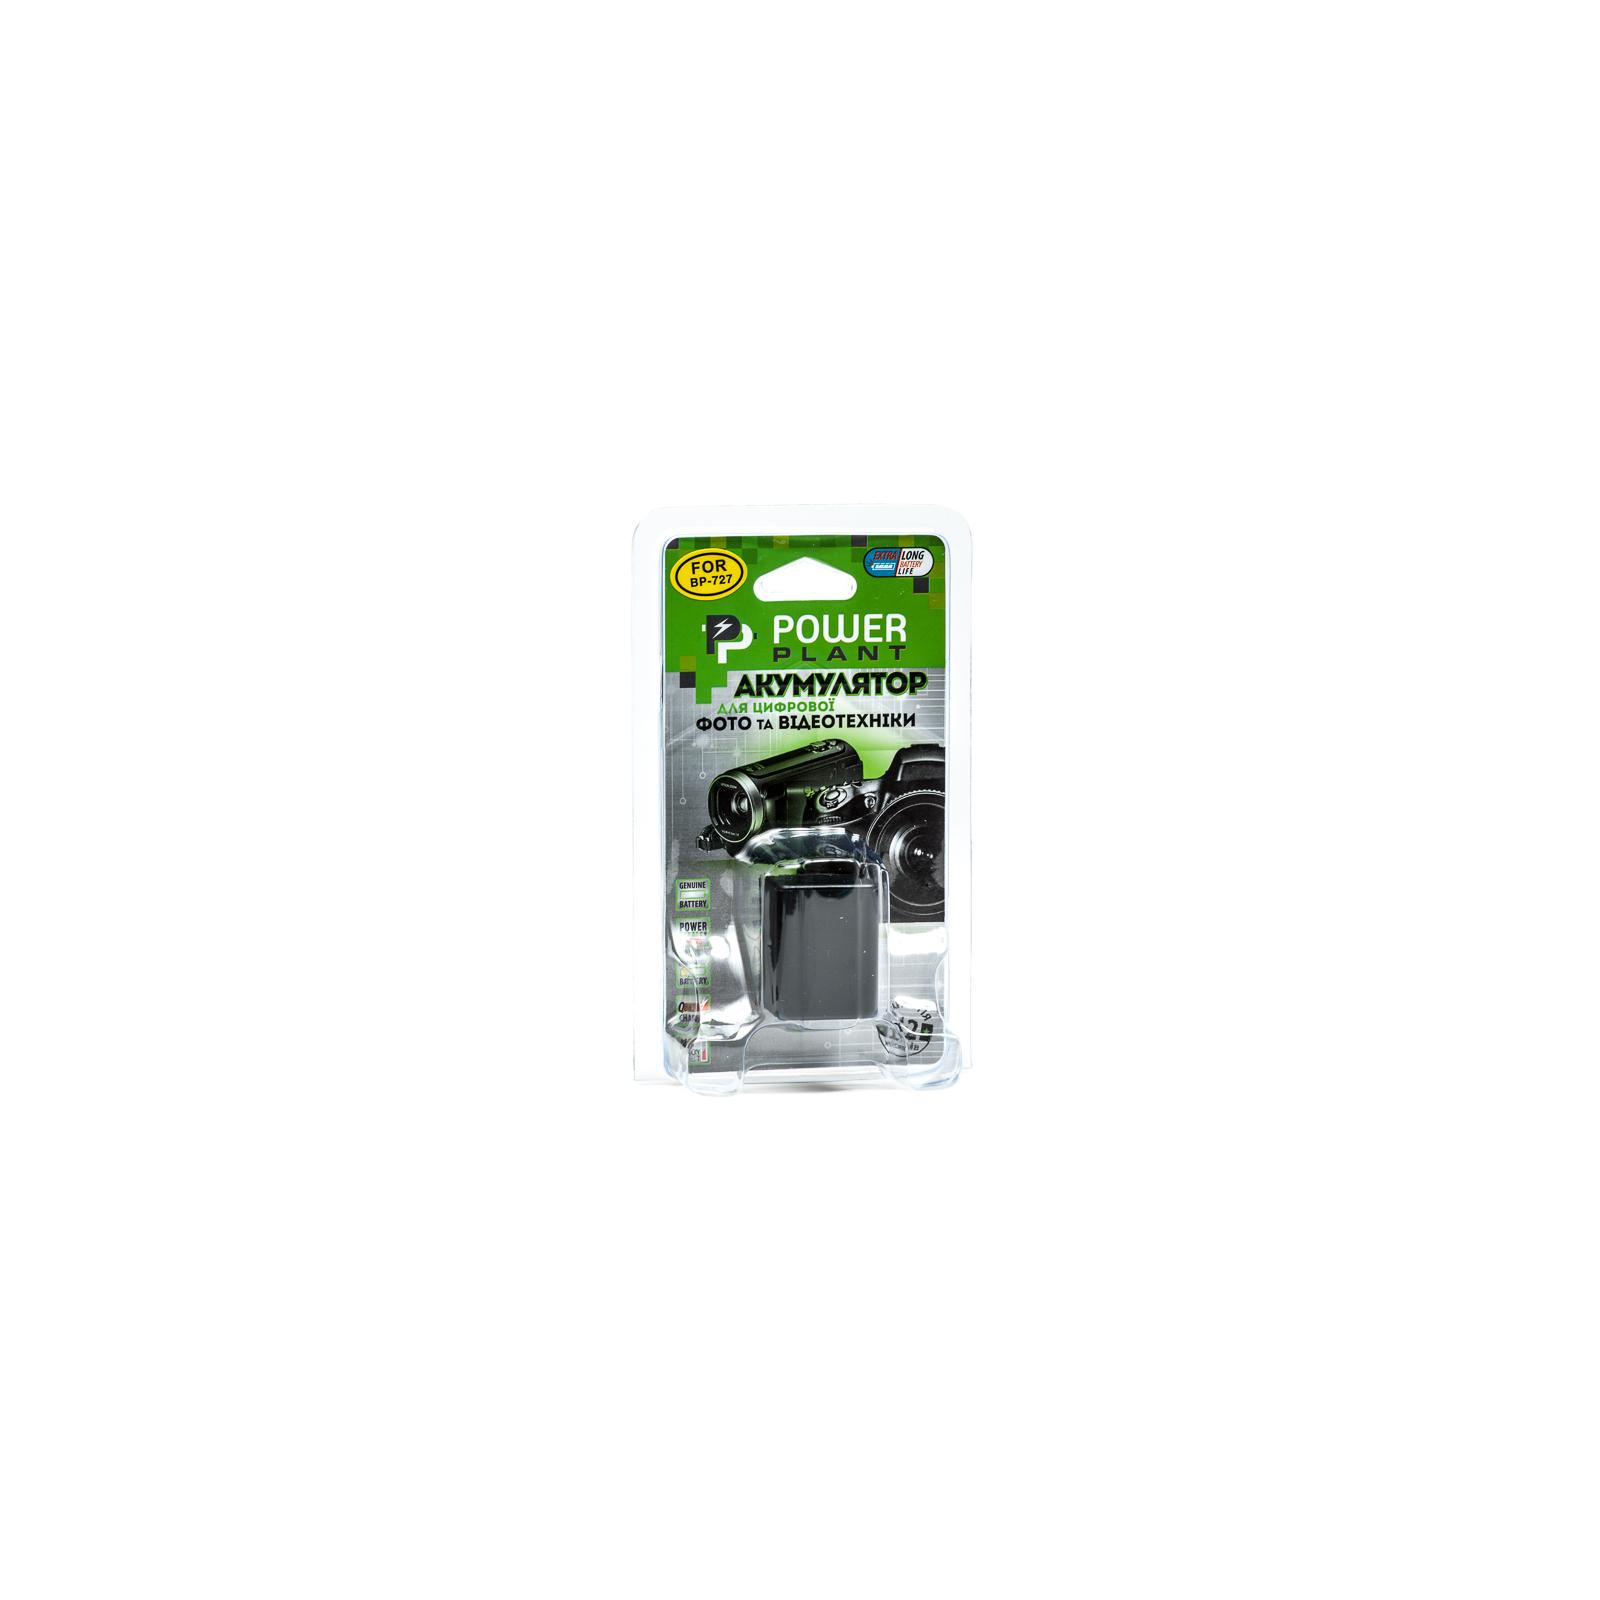 Аккумулятор к фото/видео PowerPlant Canon BP-727 chip (DV00DV1386) изображение 3